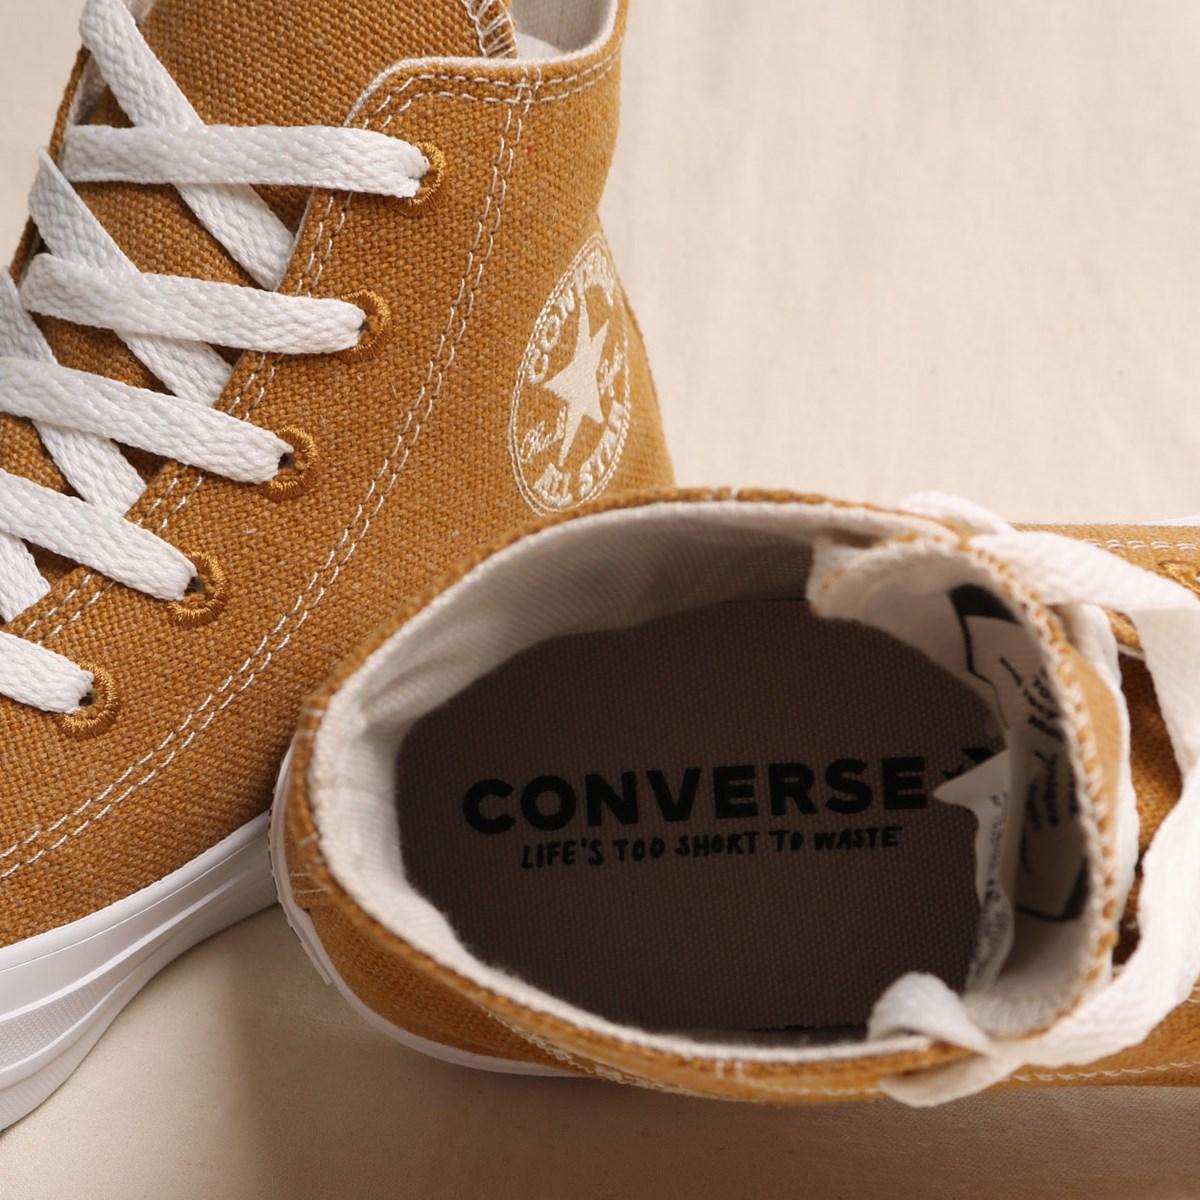 Tênis Converse Chuck Taylor All Star Renew Cotton Hi Wheat Natural White 166740C